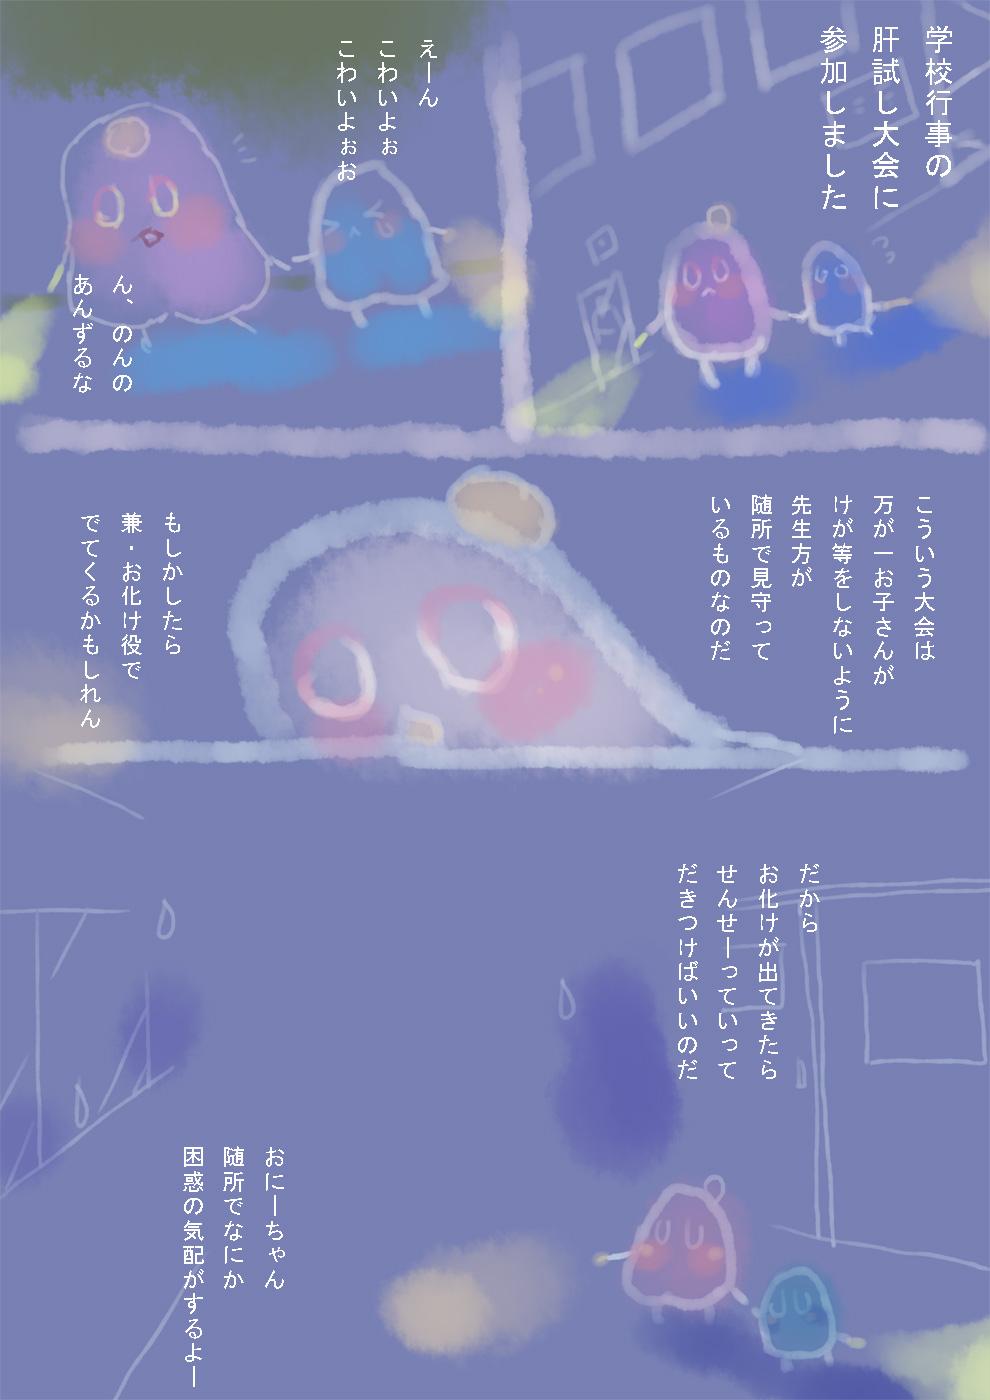 http://ahito.com/comic/short/poji/img/2018/poji20180515.jpg